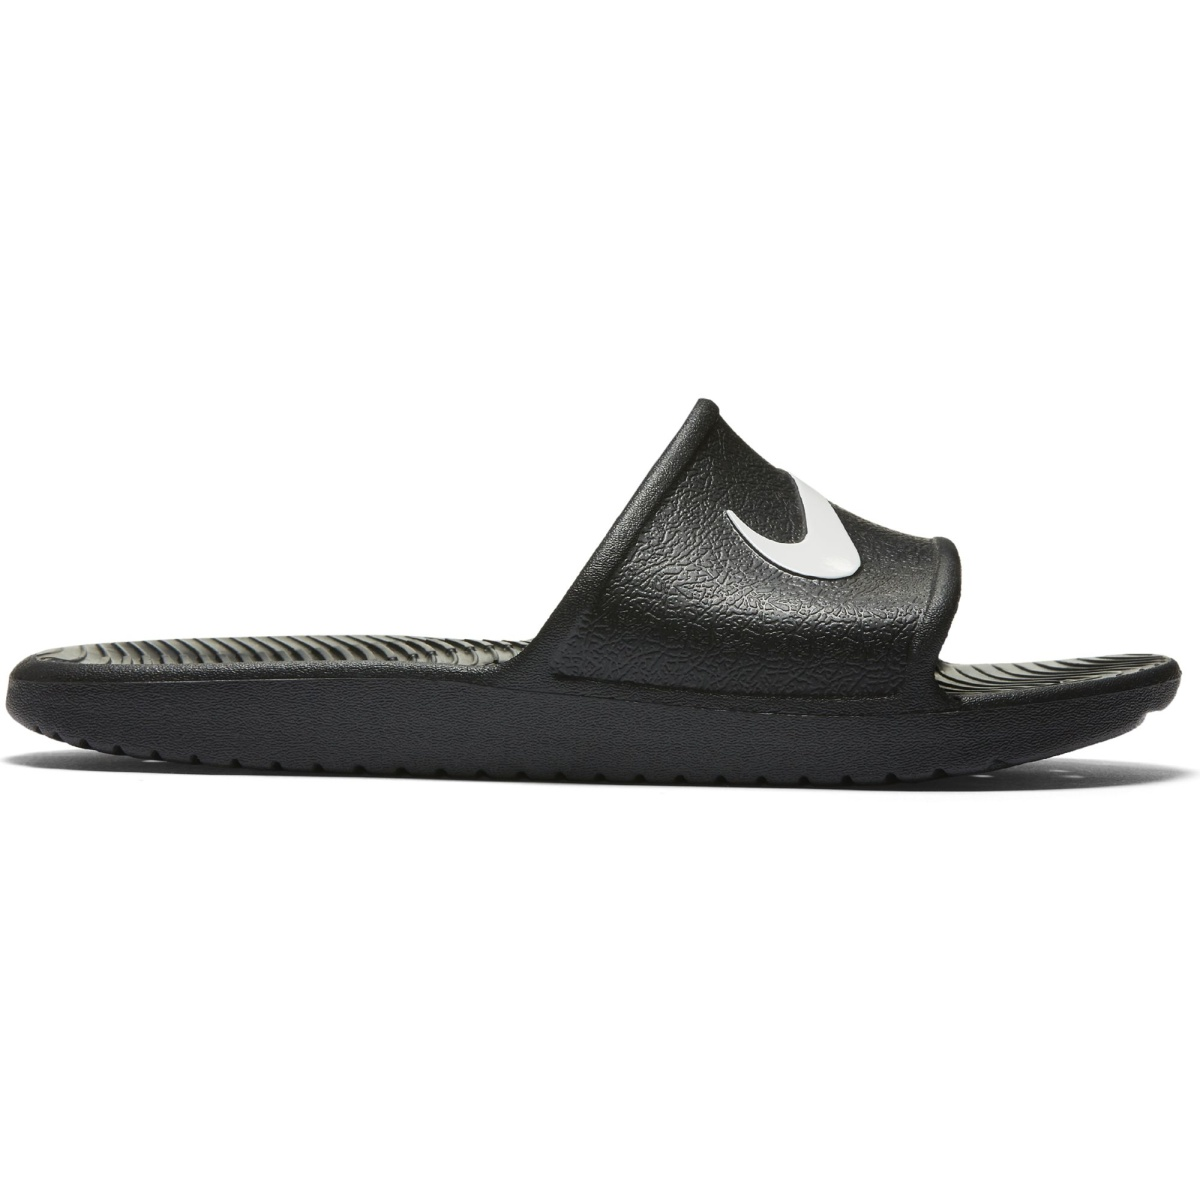 4277a8e5274ab Nike Kawa Shower čierna 41 - Glami.sk